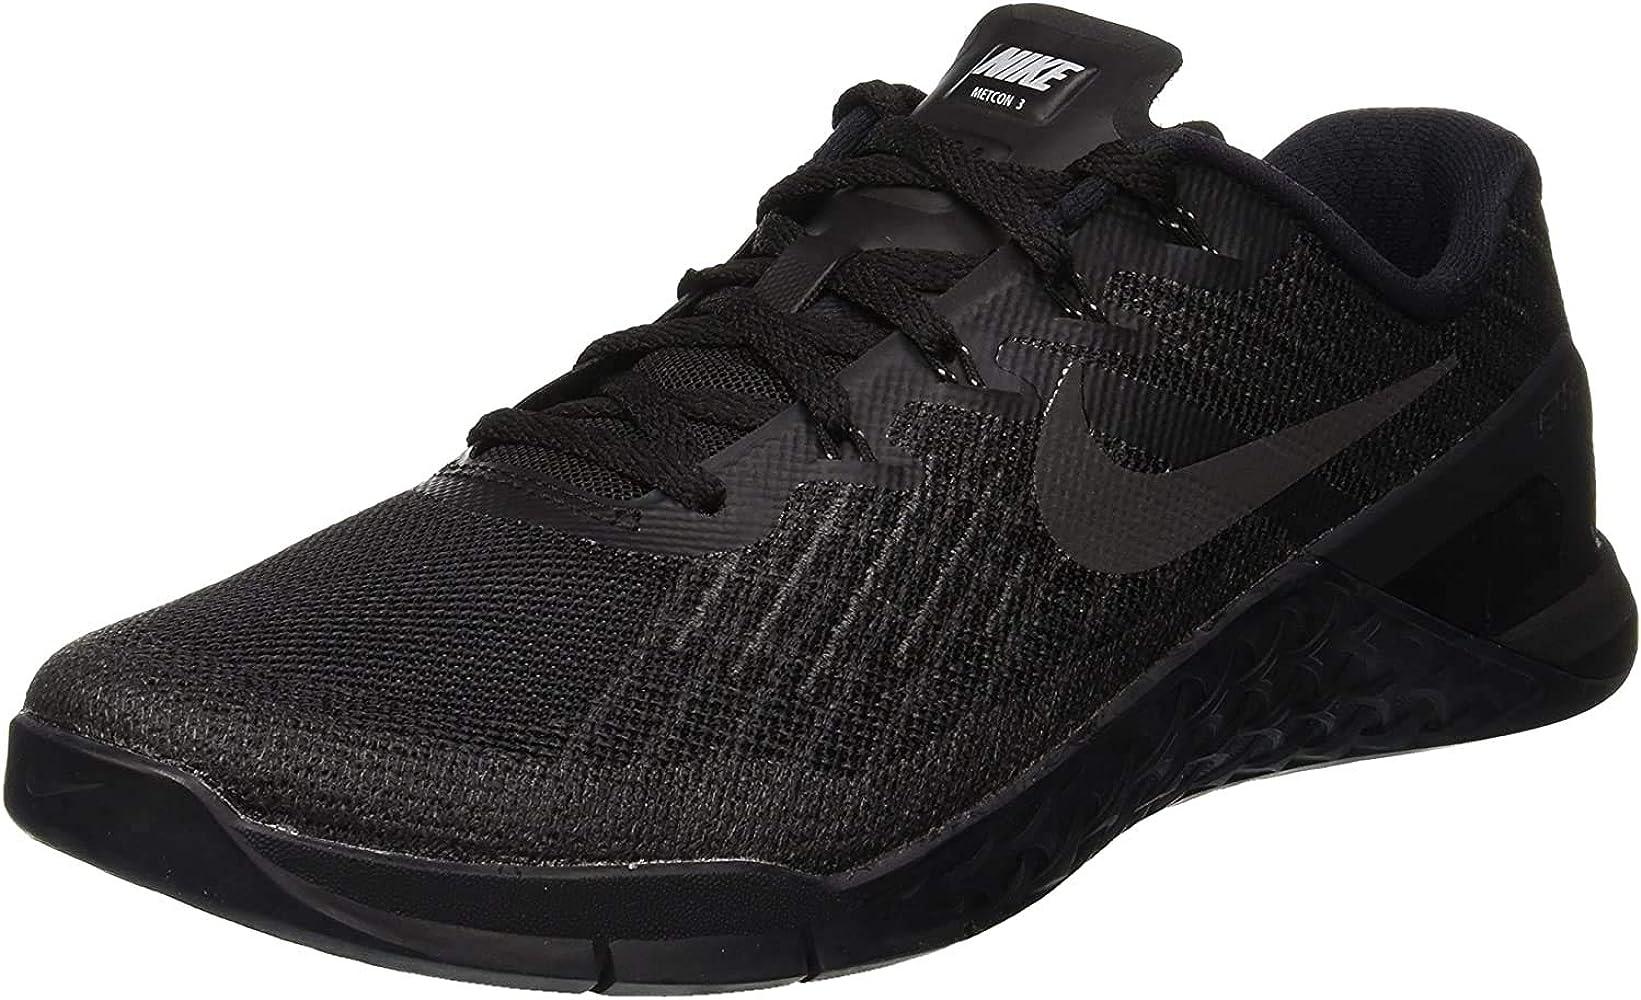 Amazon.com: Nike Metcon 3 Size 8 Mens